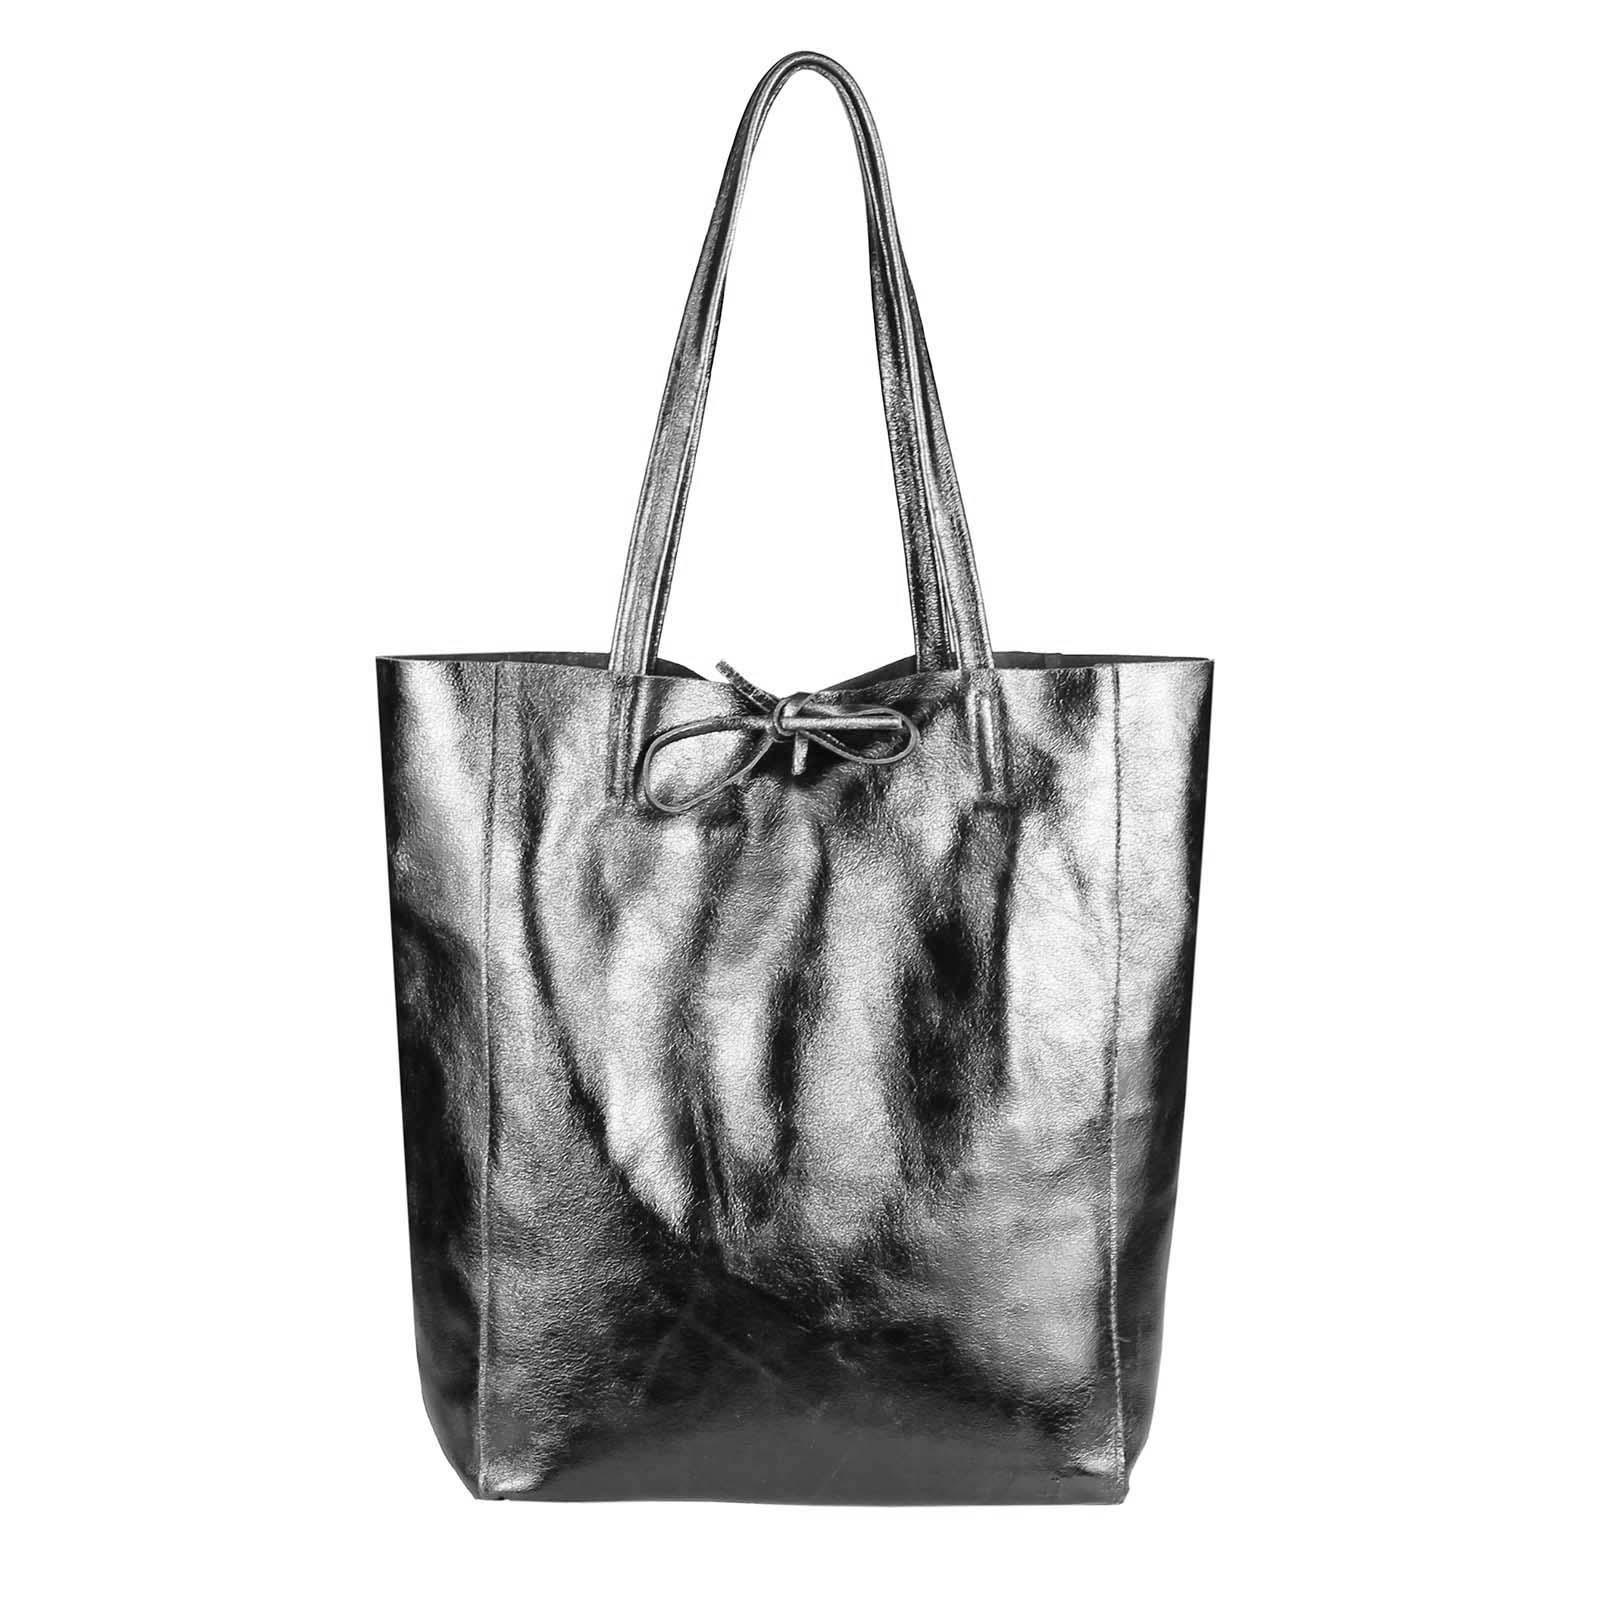 cb168f341248d OBC Made in Italy DAMEN LEDER TASCHE DIN-A4 Shopper Schultertasche  Henkeltasche Tote Bag Metallic